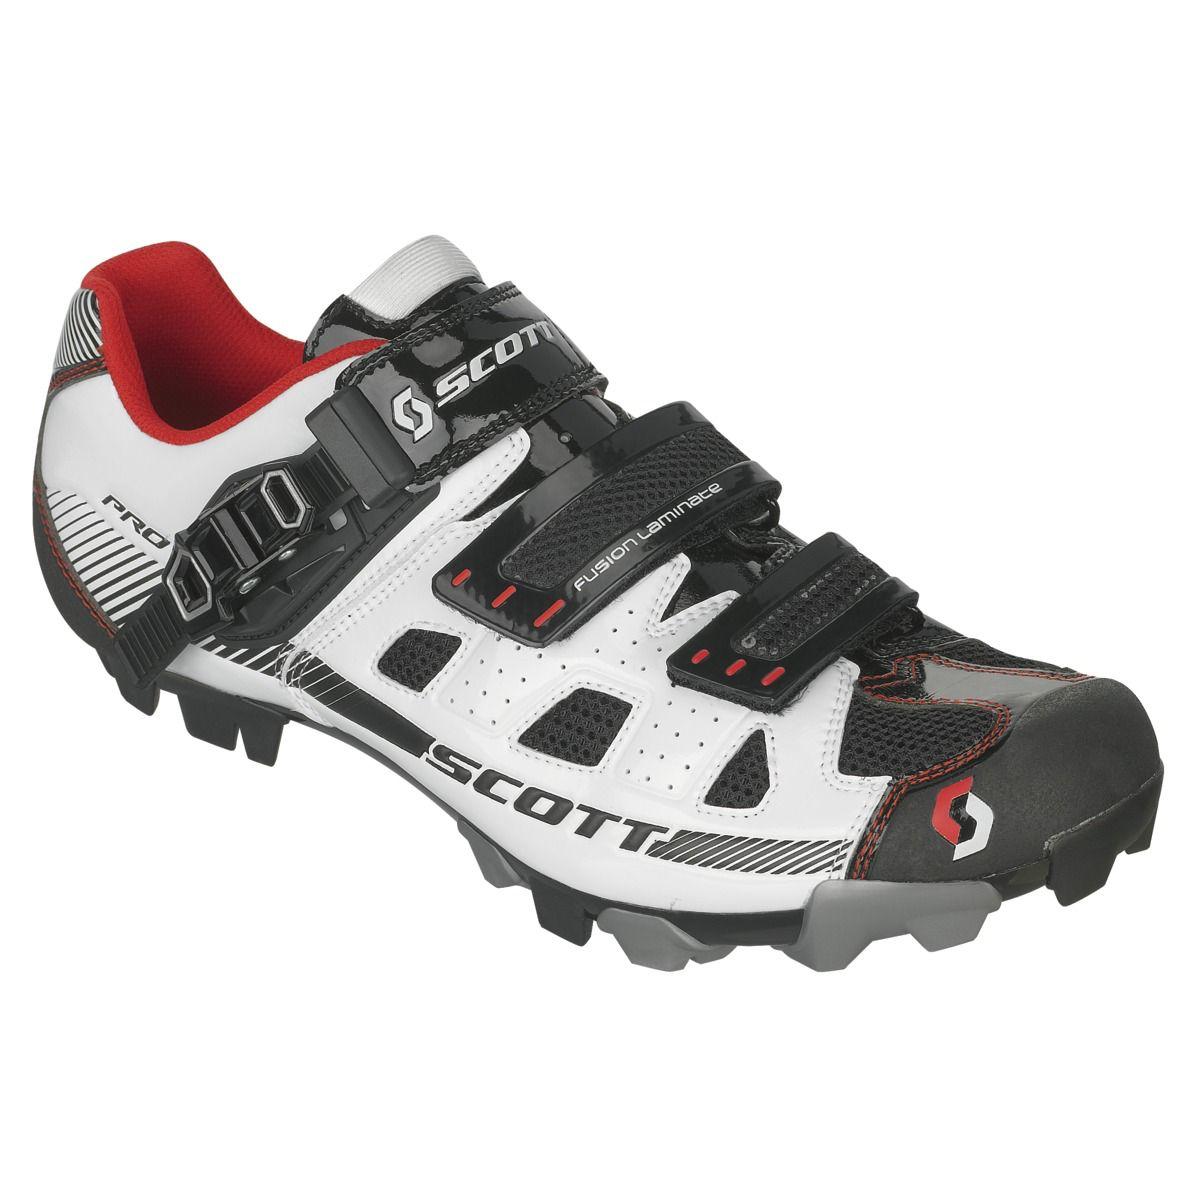 SCOTT-Shoe-MTB-Pro-white-black